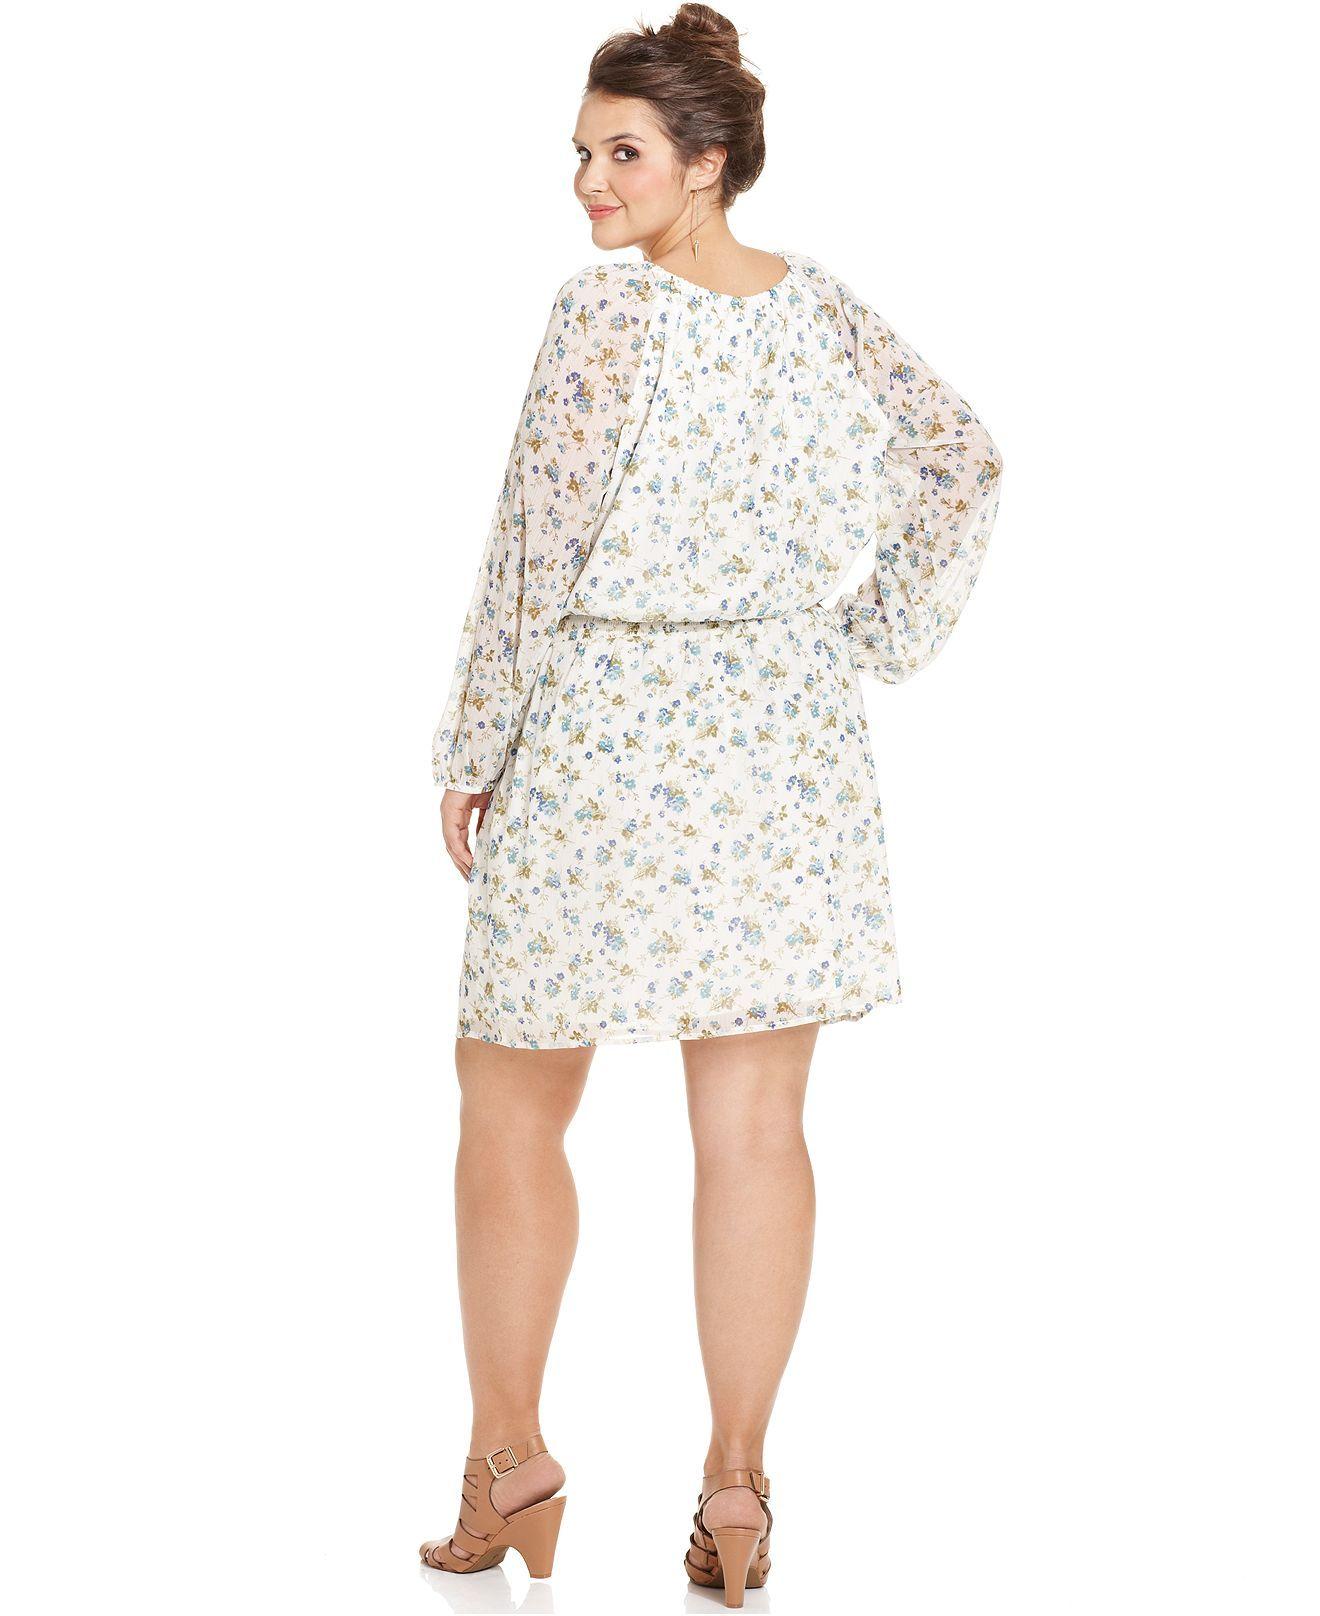 Jessica Simpson Plus Size Dresses